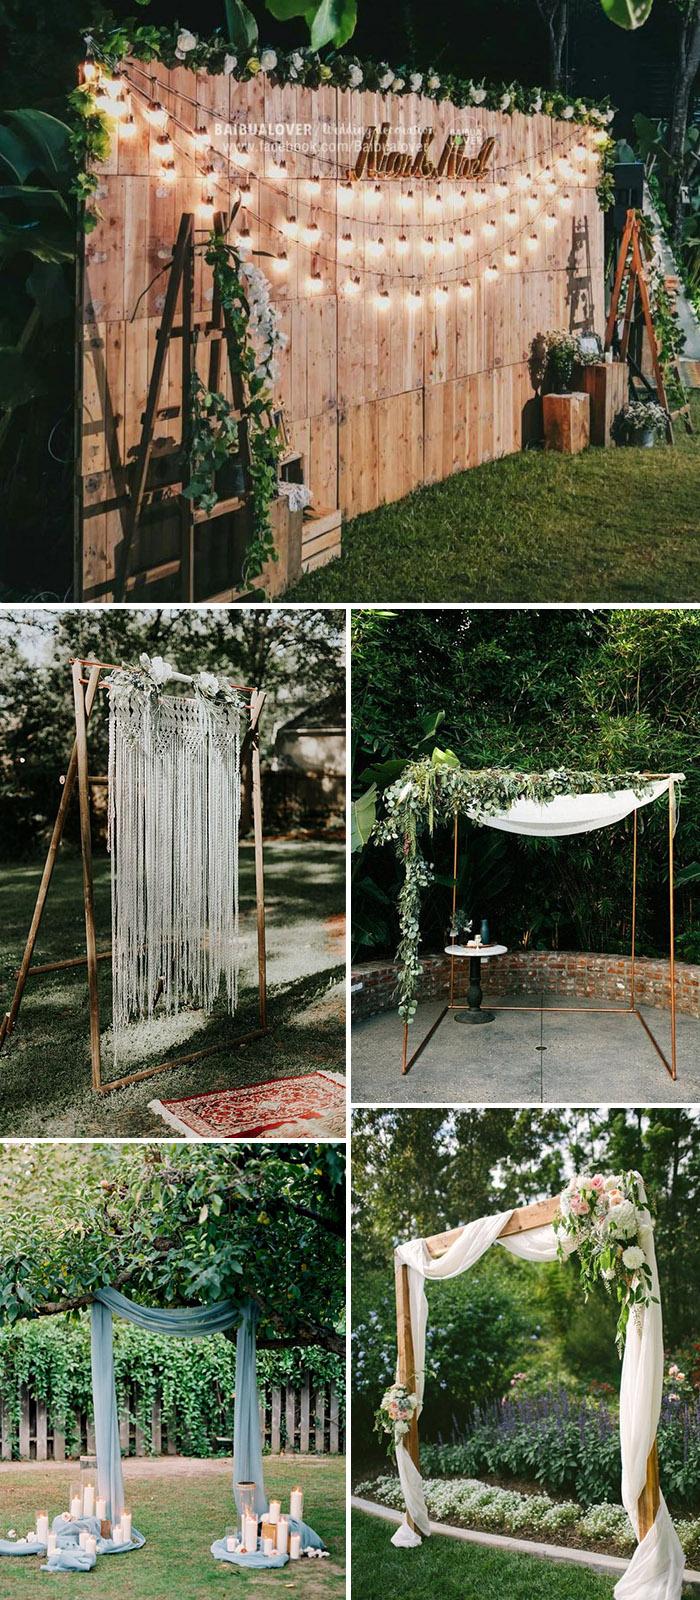 30 Ingenious Ideas For A Small Intimate Backyard Wedding On A Budget Elegantweddinginvites Com Blog Backyard Wedding Decorations Diy Backyard Wedding Small Backyard Wedding